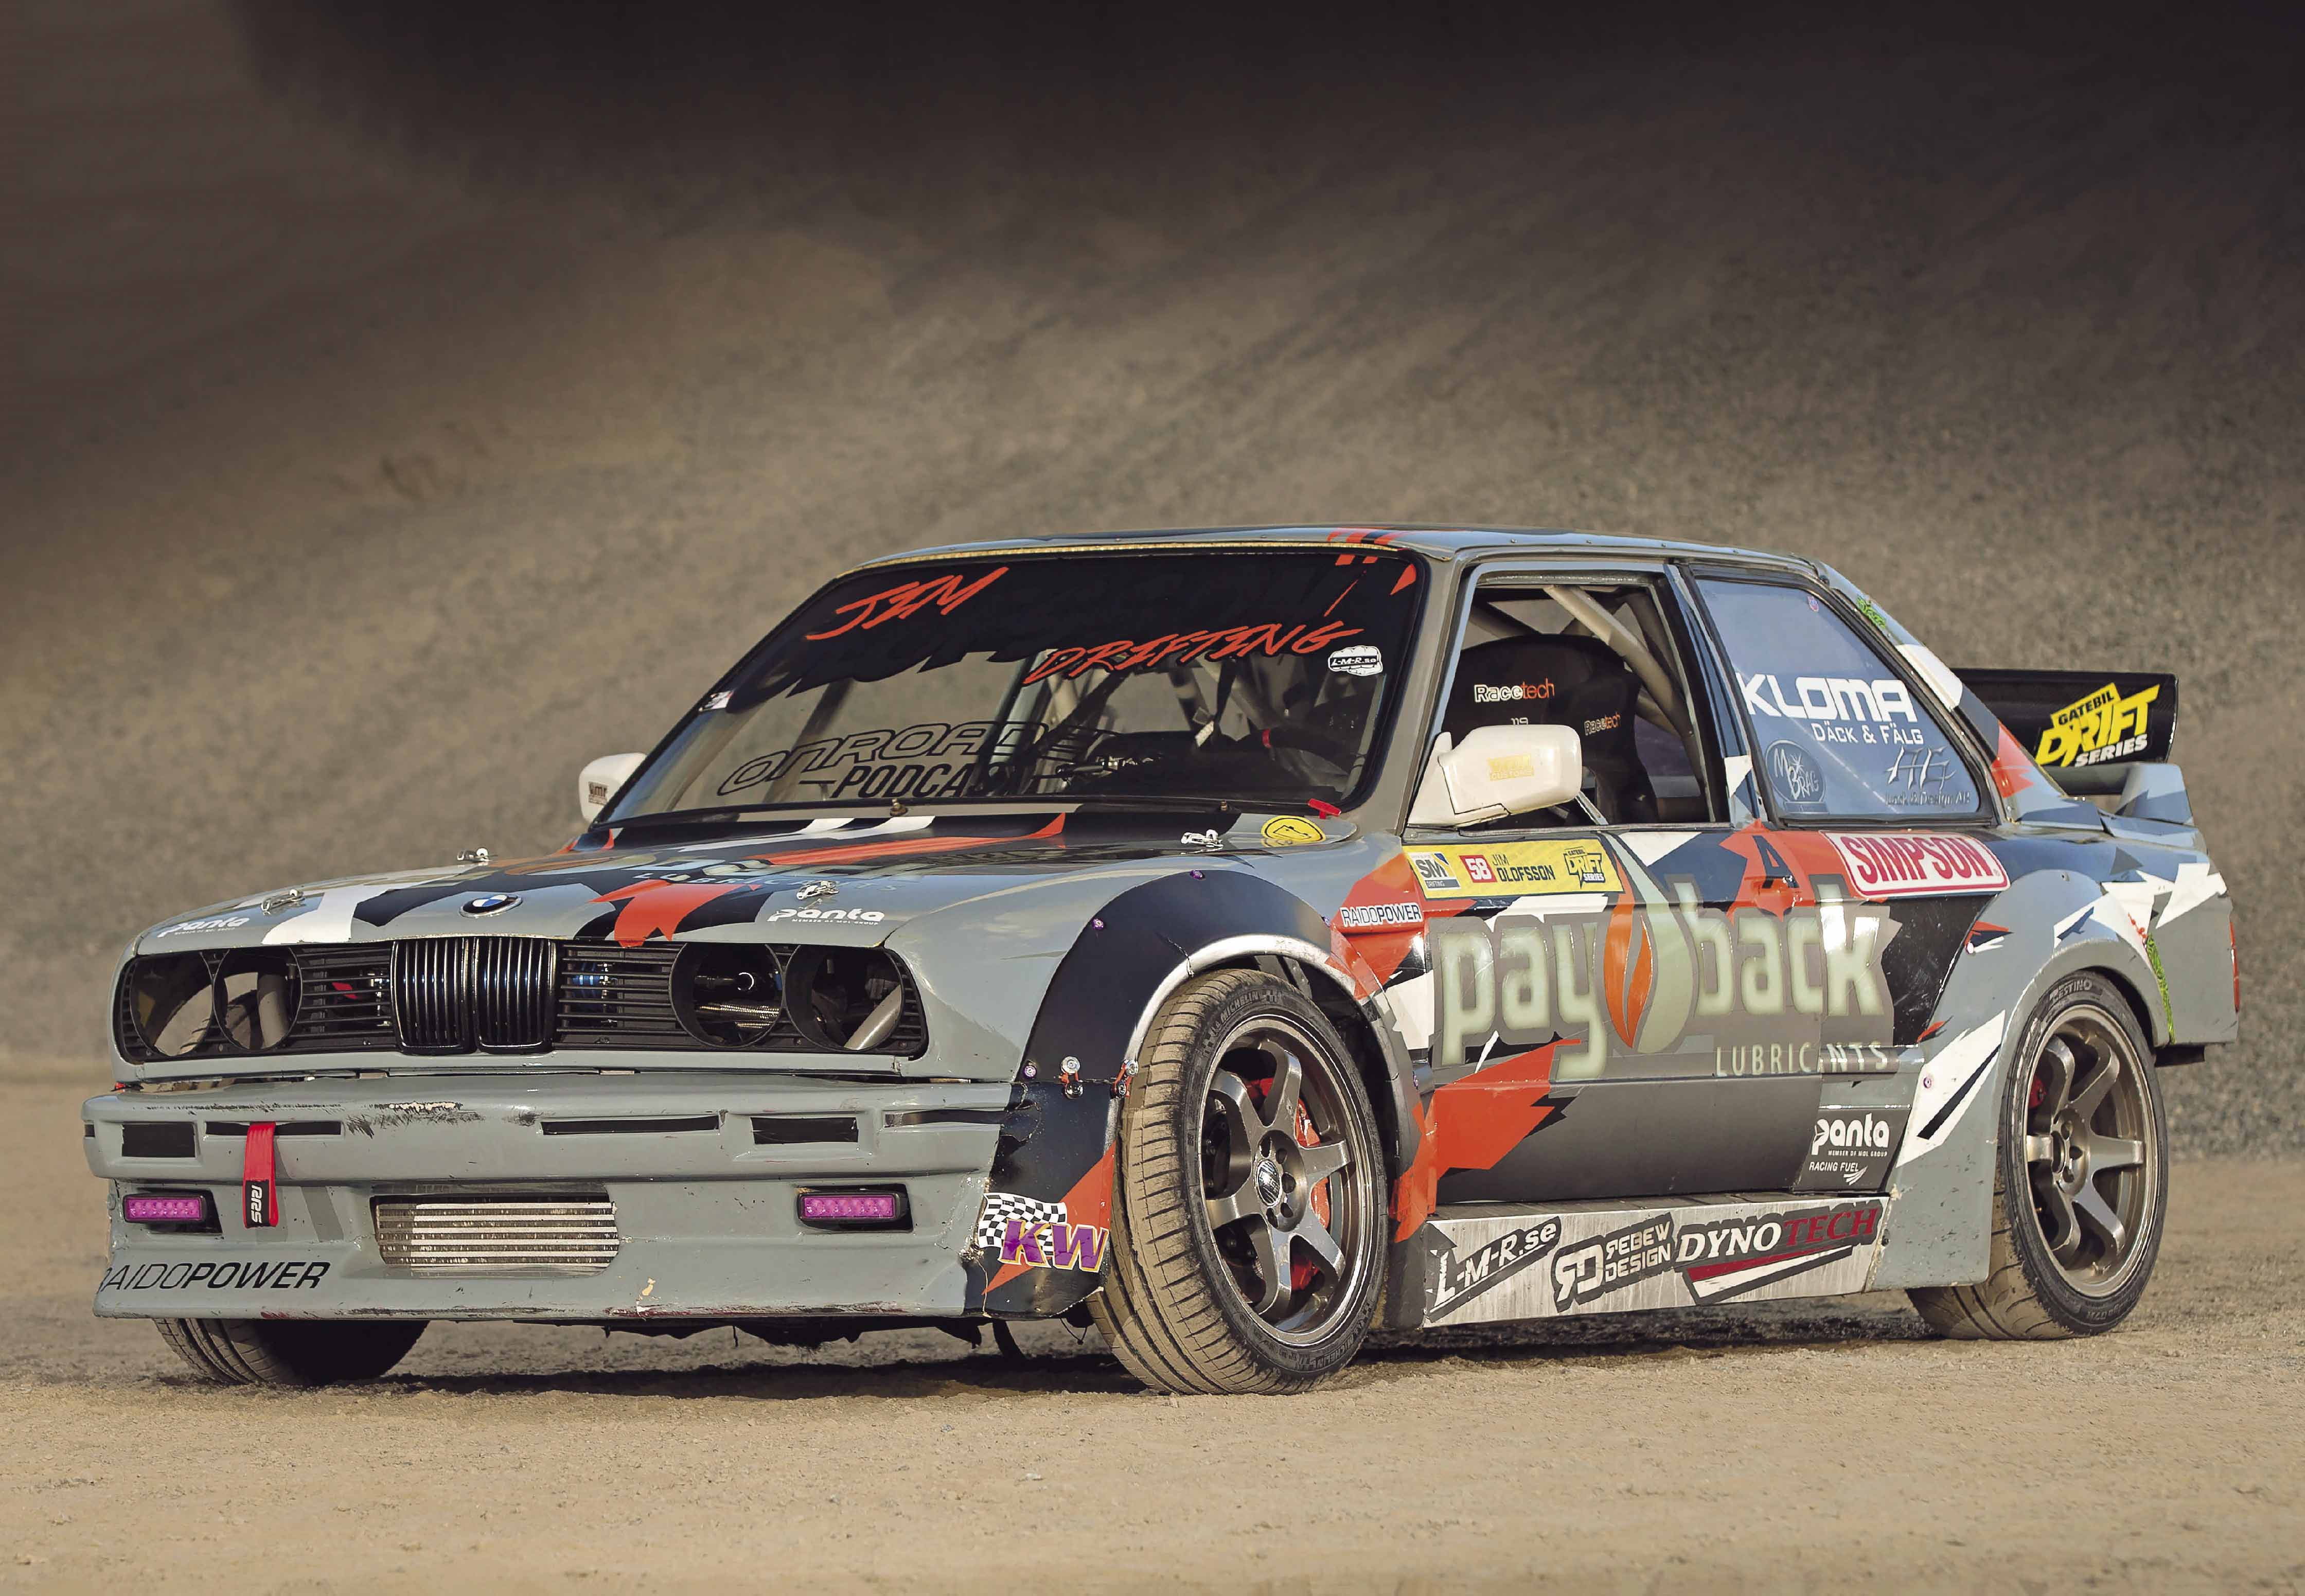 940whp M50b25 Turbo Drift Bmw E30 Coupe Drive My Blogs Drive